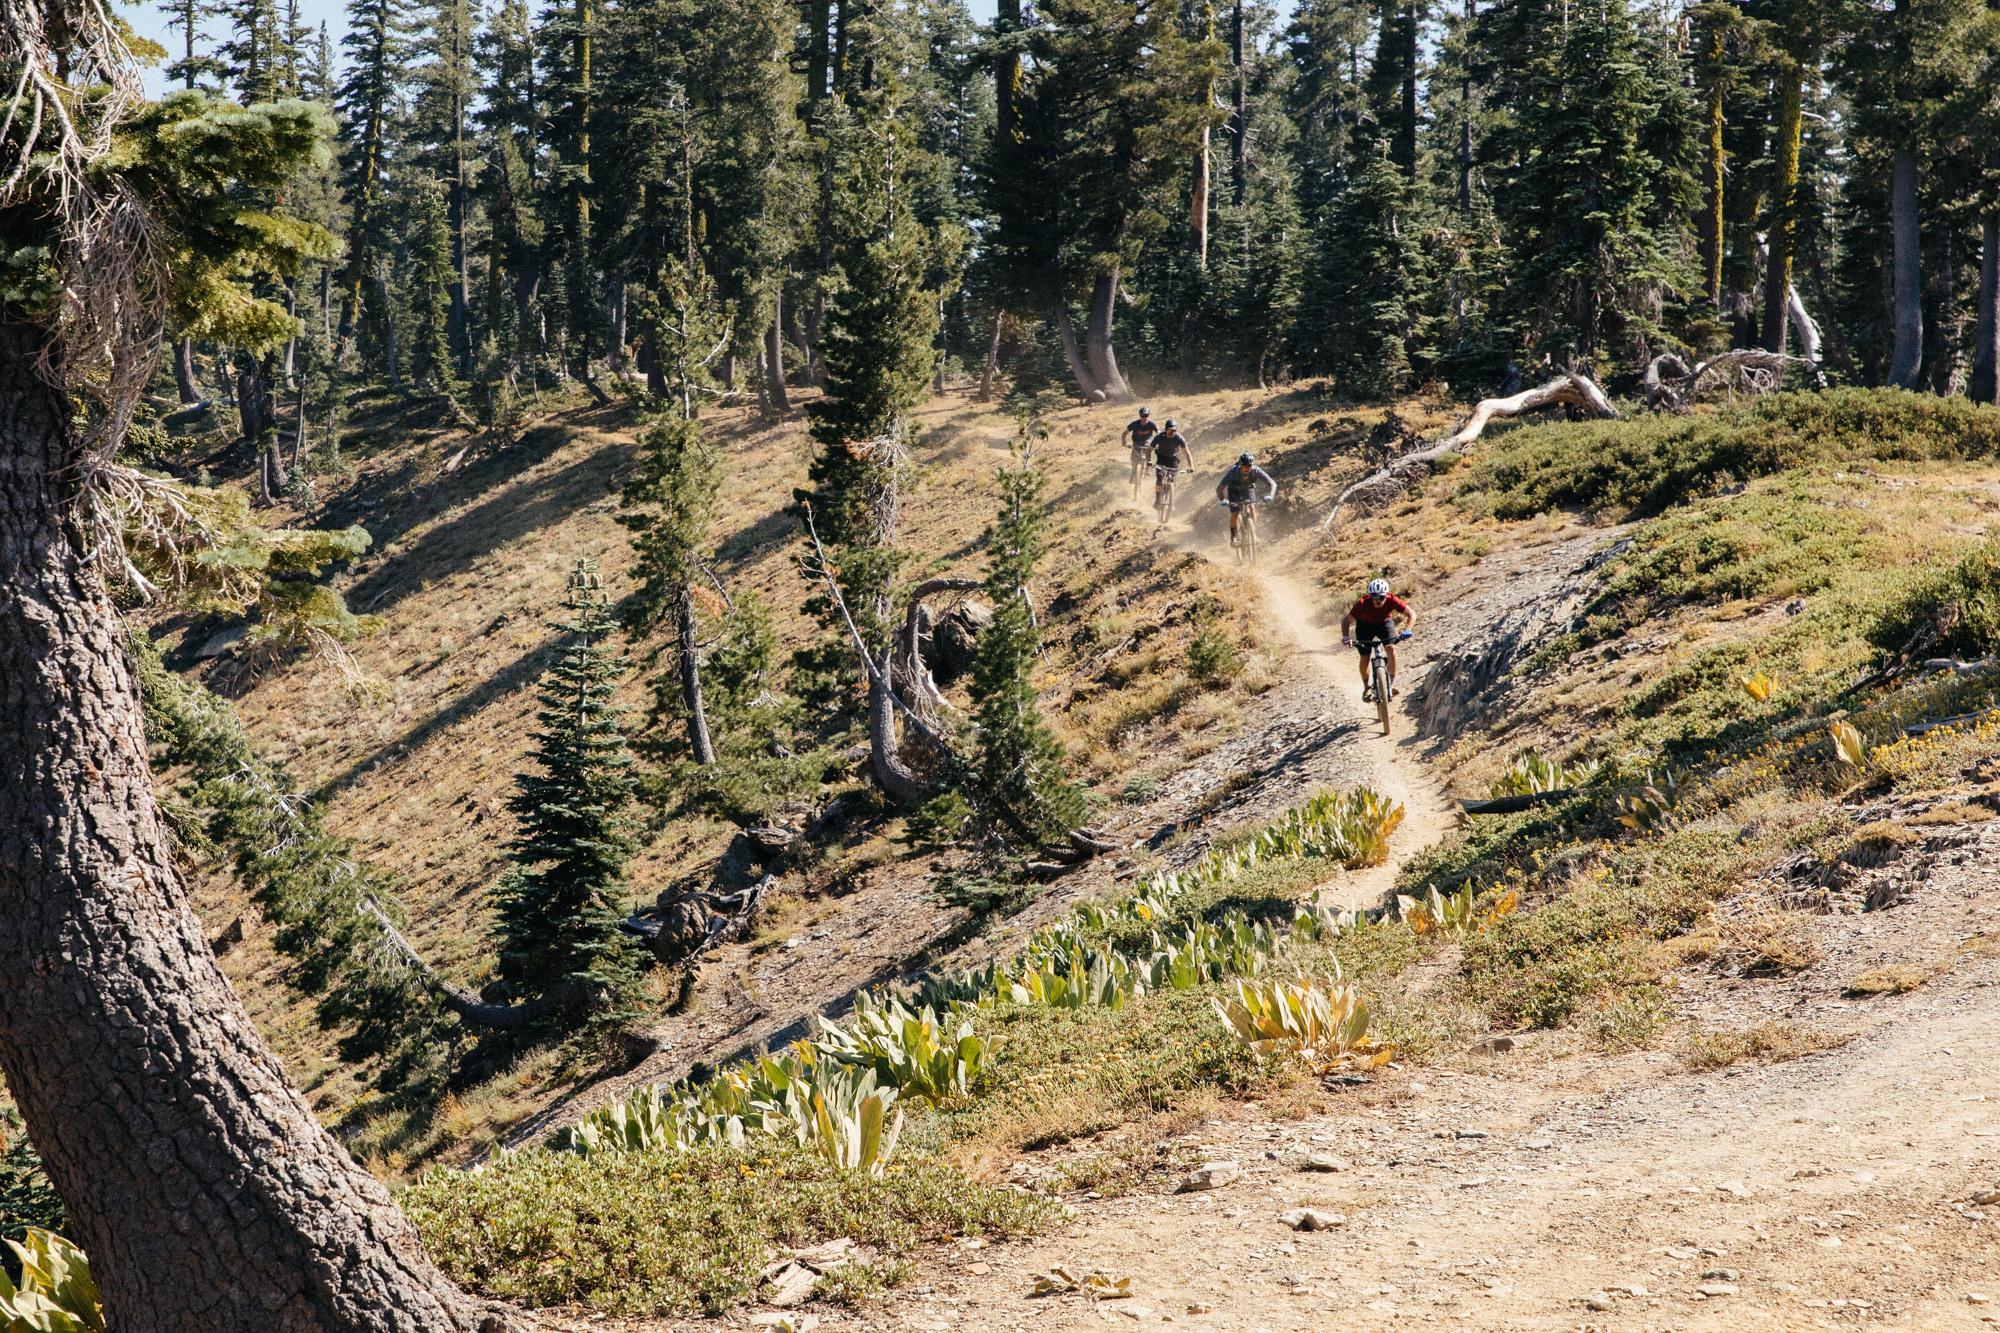 Gold Valley Rim Trail